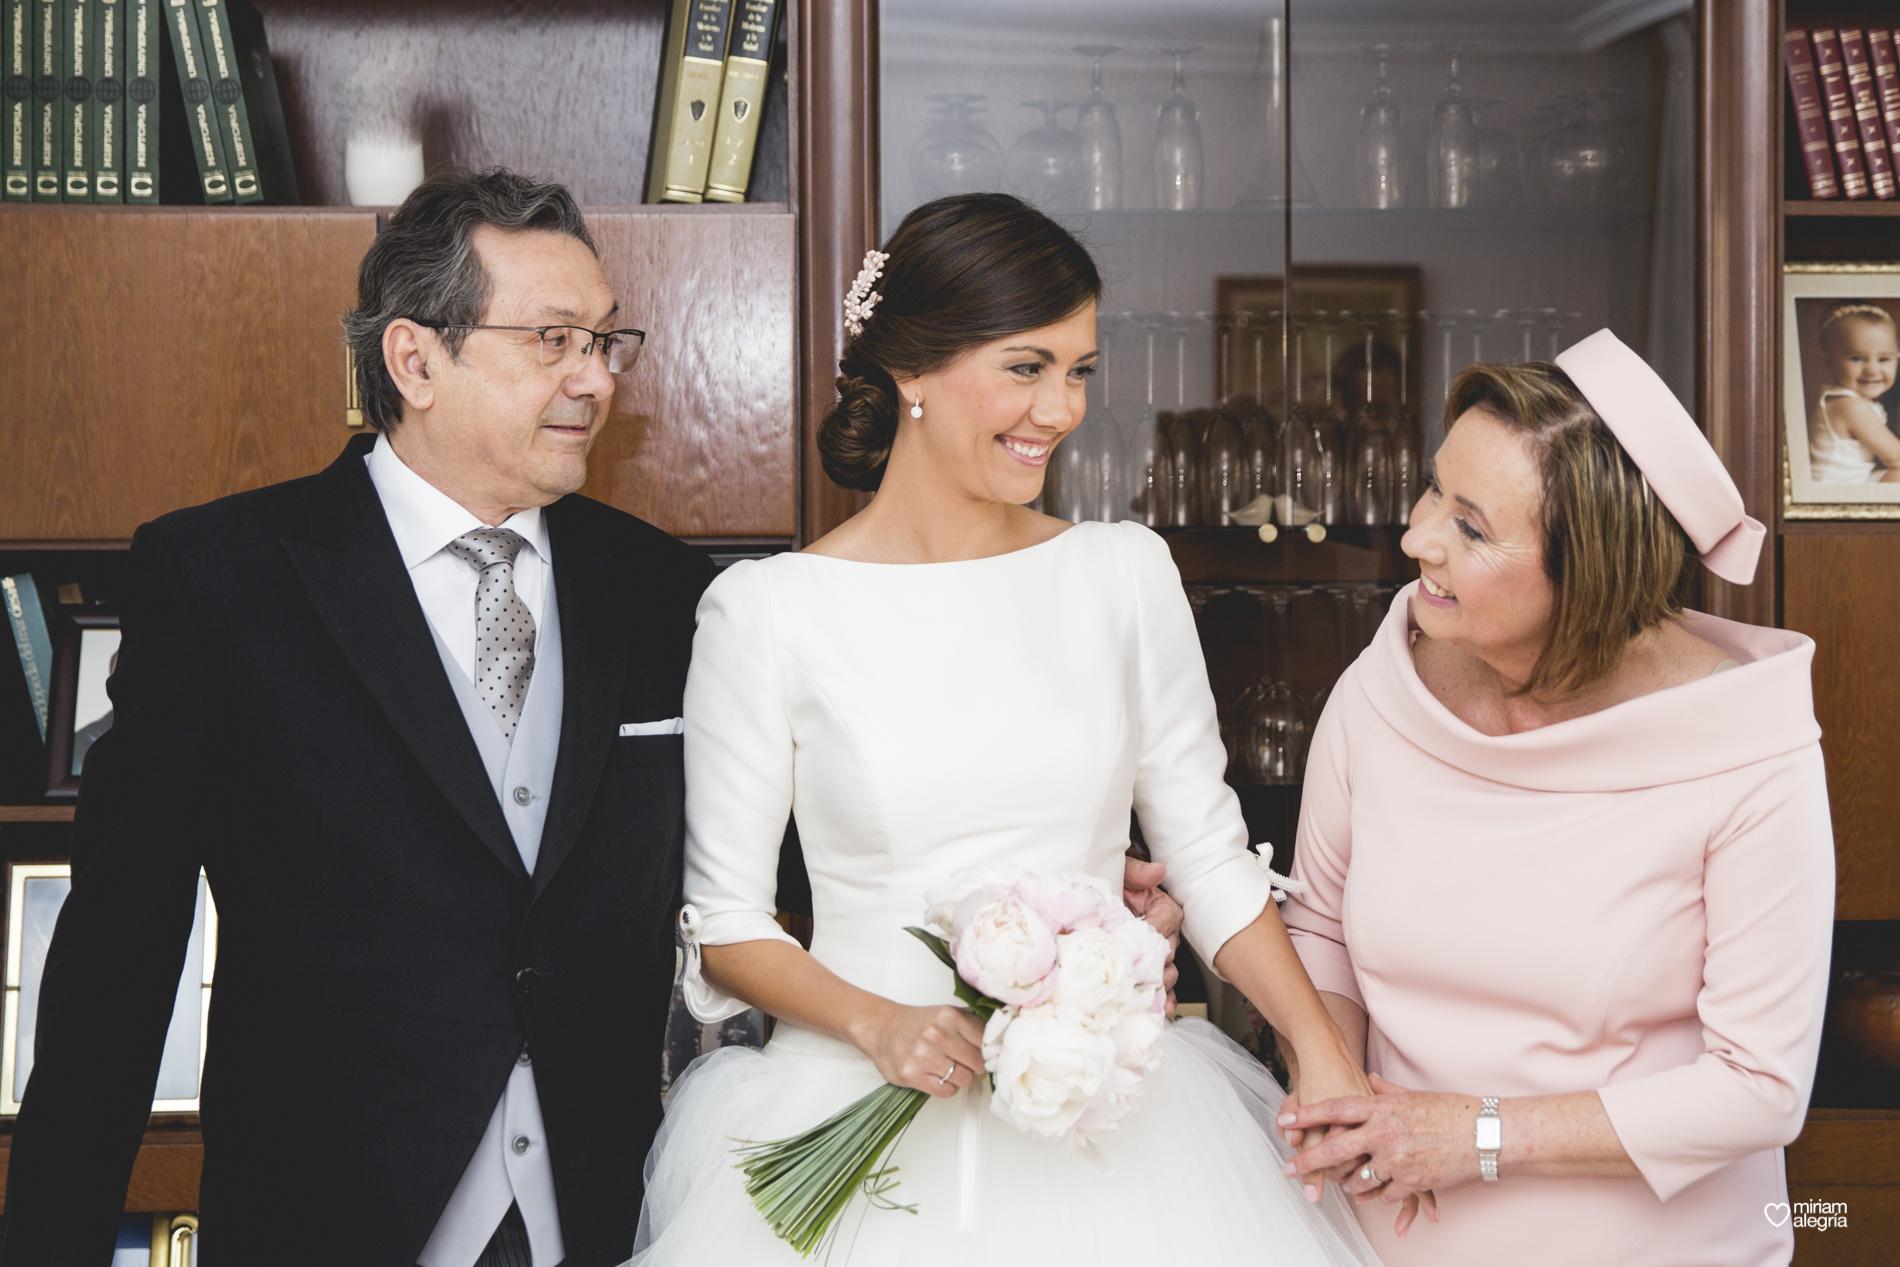 boda-en-la-catedral-de-murcia-miriam-alegria-fotografos-boda-murcia-19